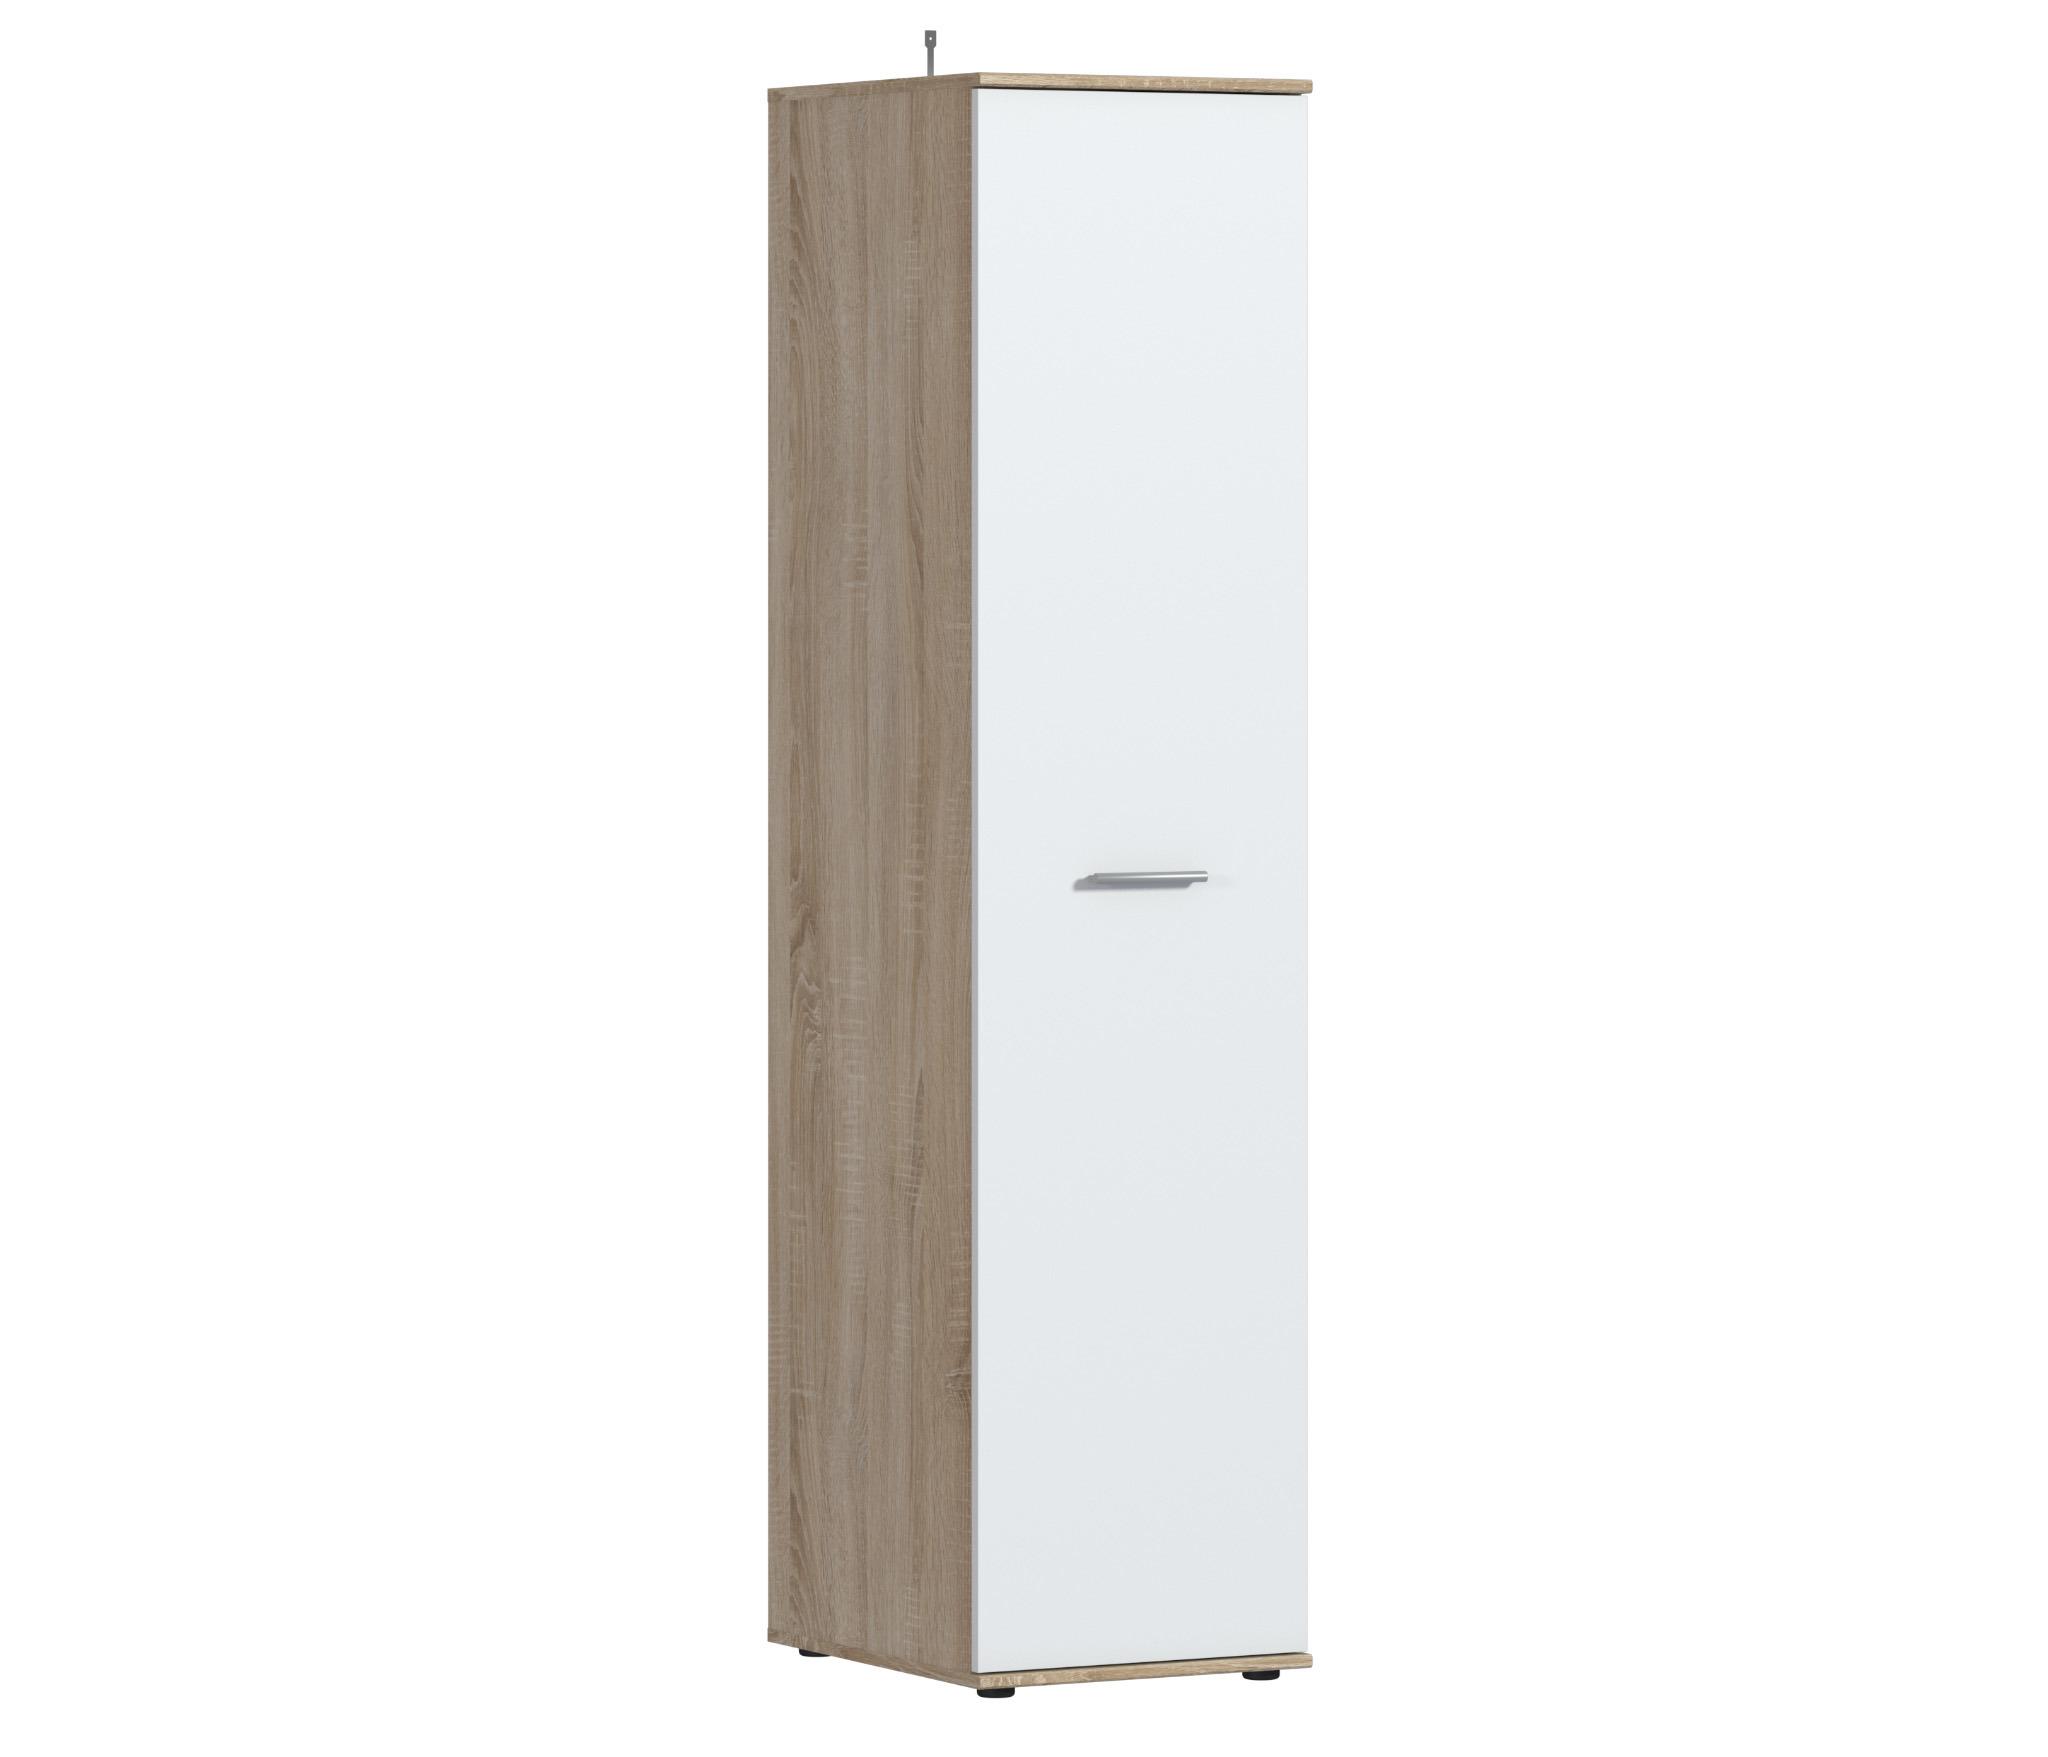 Мамбо СБ-2677 Шкаф 1-о дверныйШкафы<br><br><br>Длина мм: 450<br>Высота мм: 1911<br>Глубина мм: 553